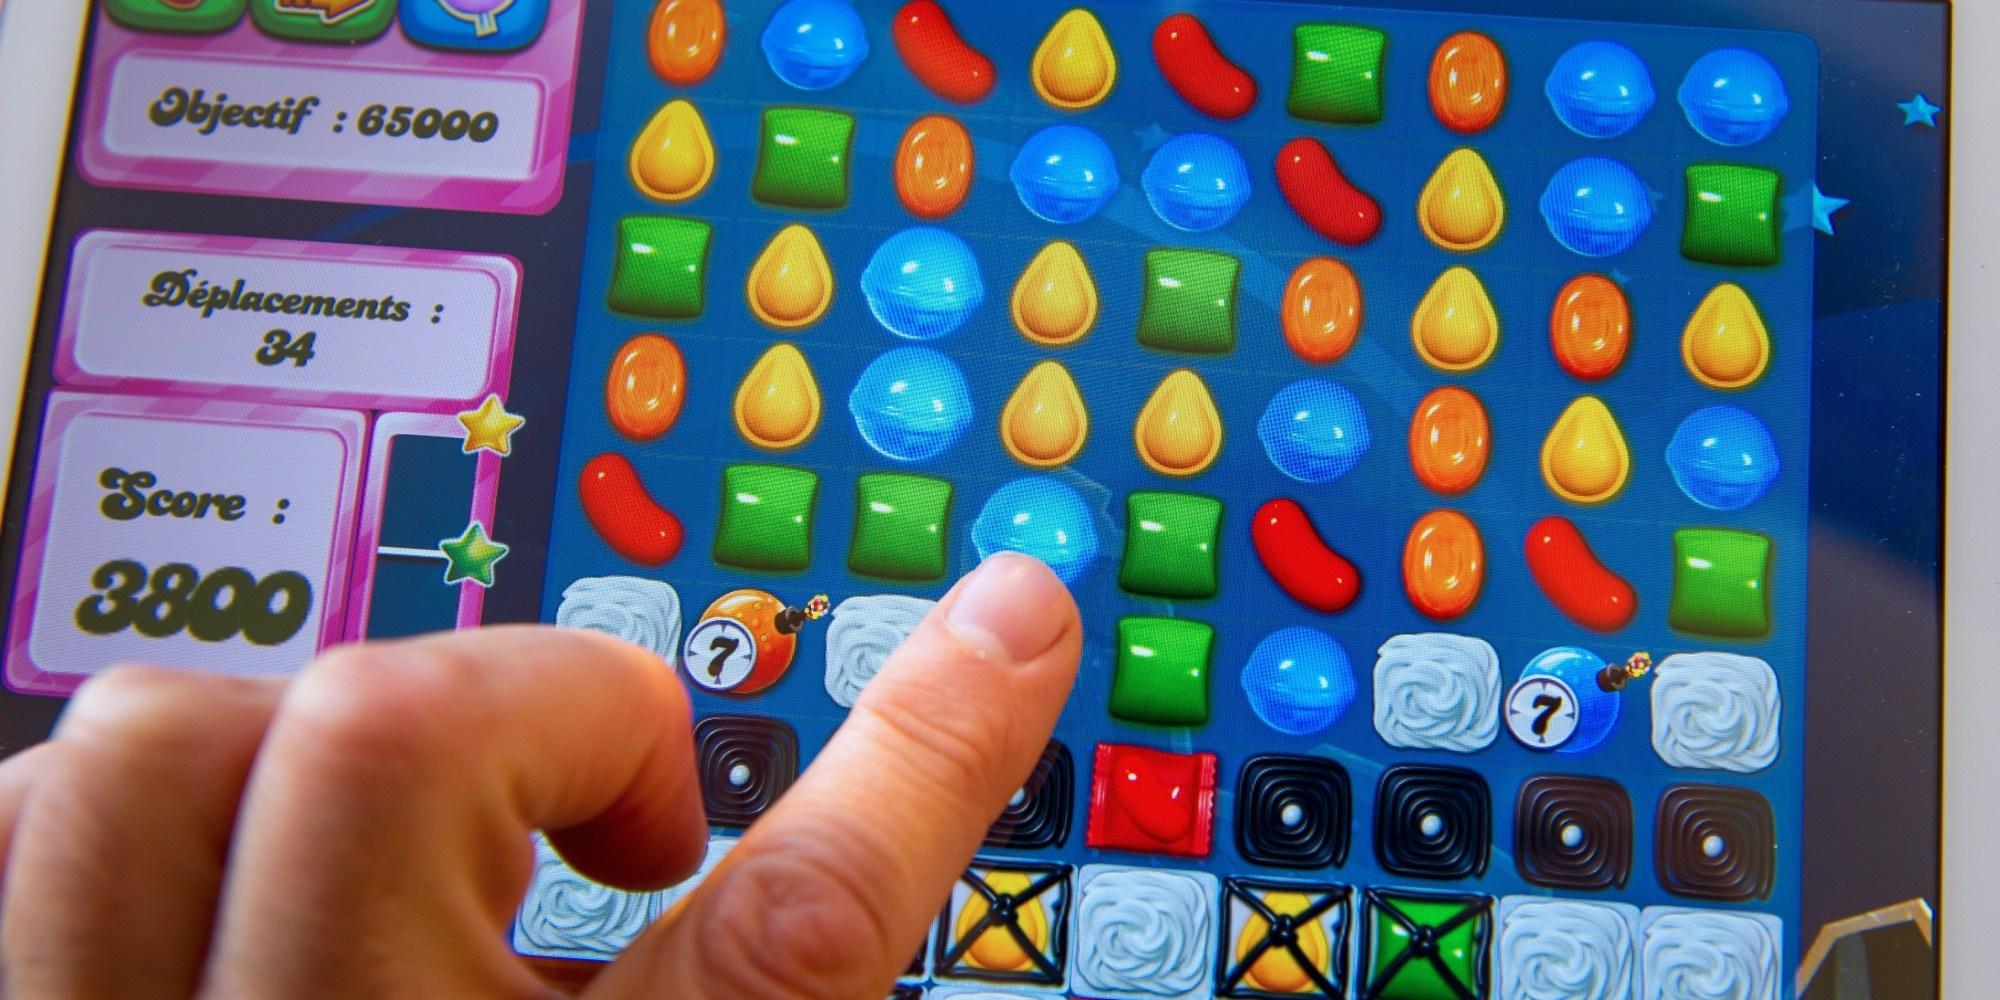 tablet games free online